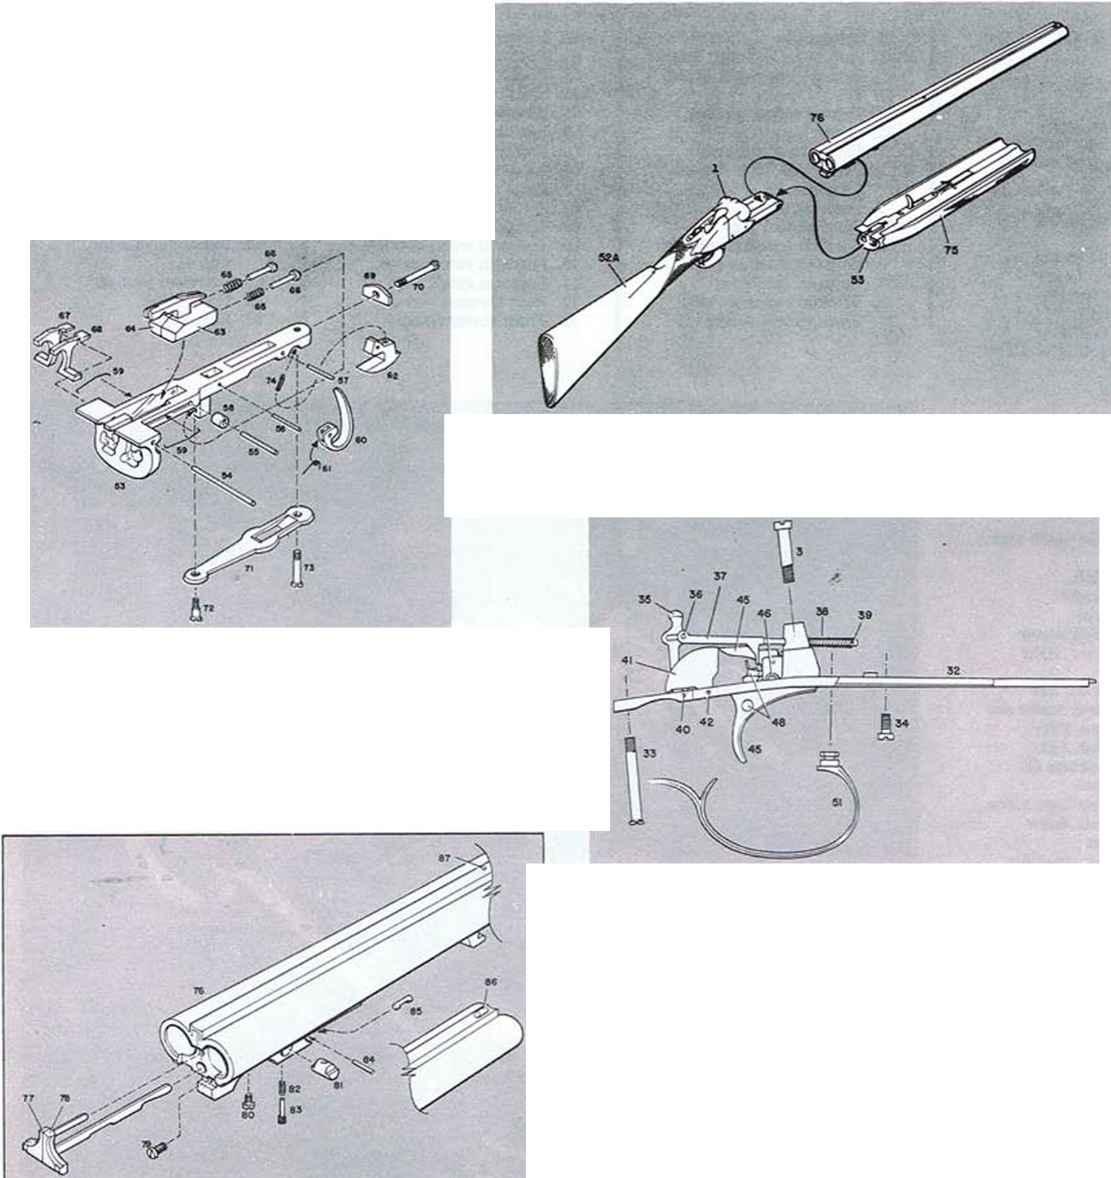 Winchester Shotgun Firearms Assembly Bev Fitchett S